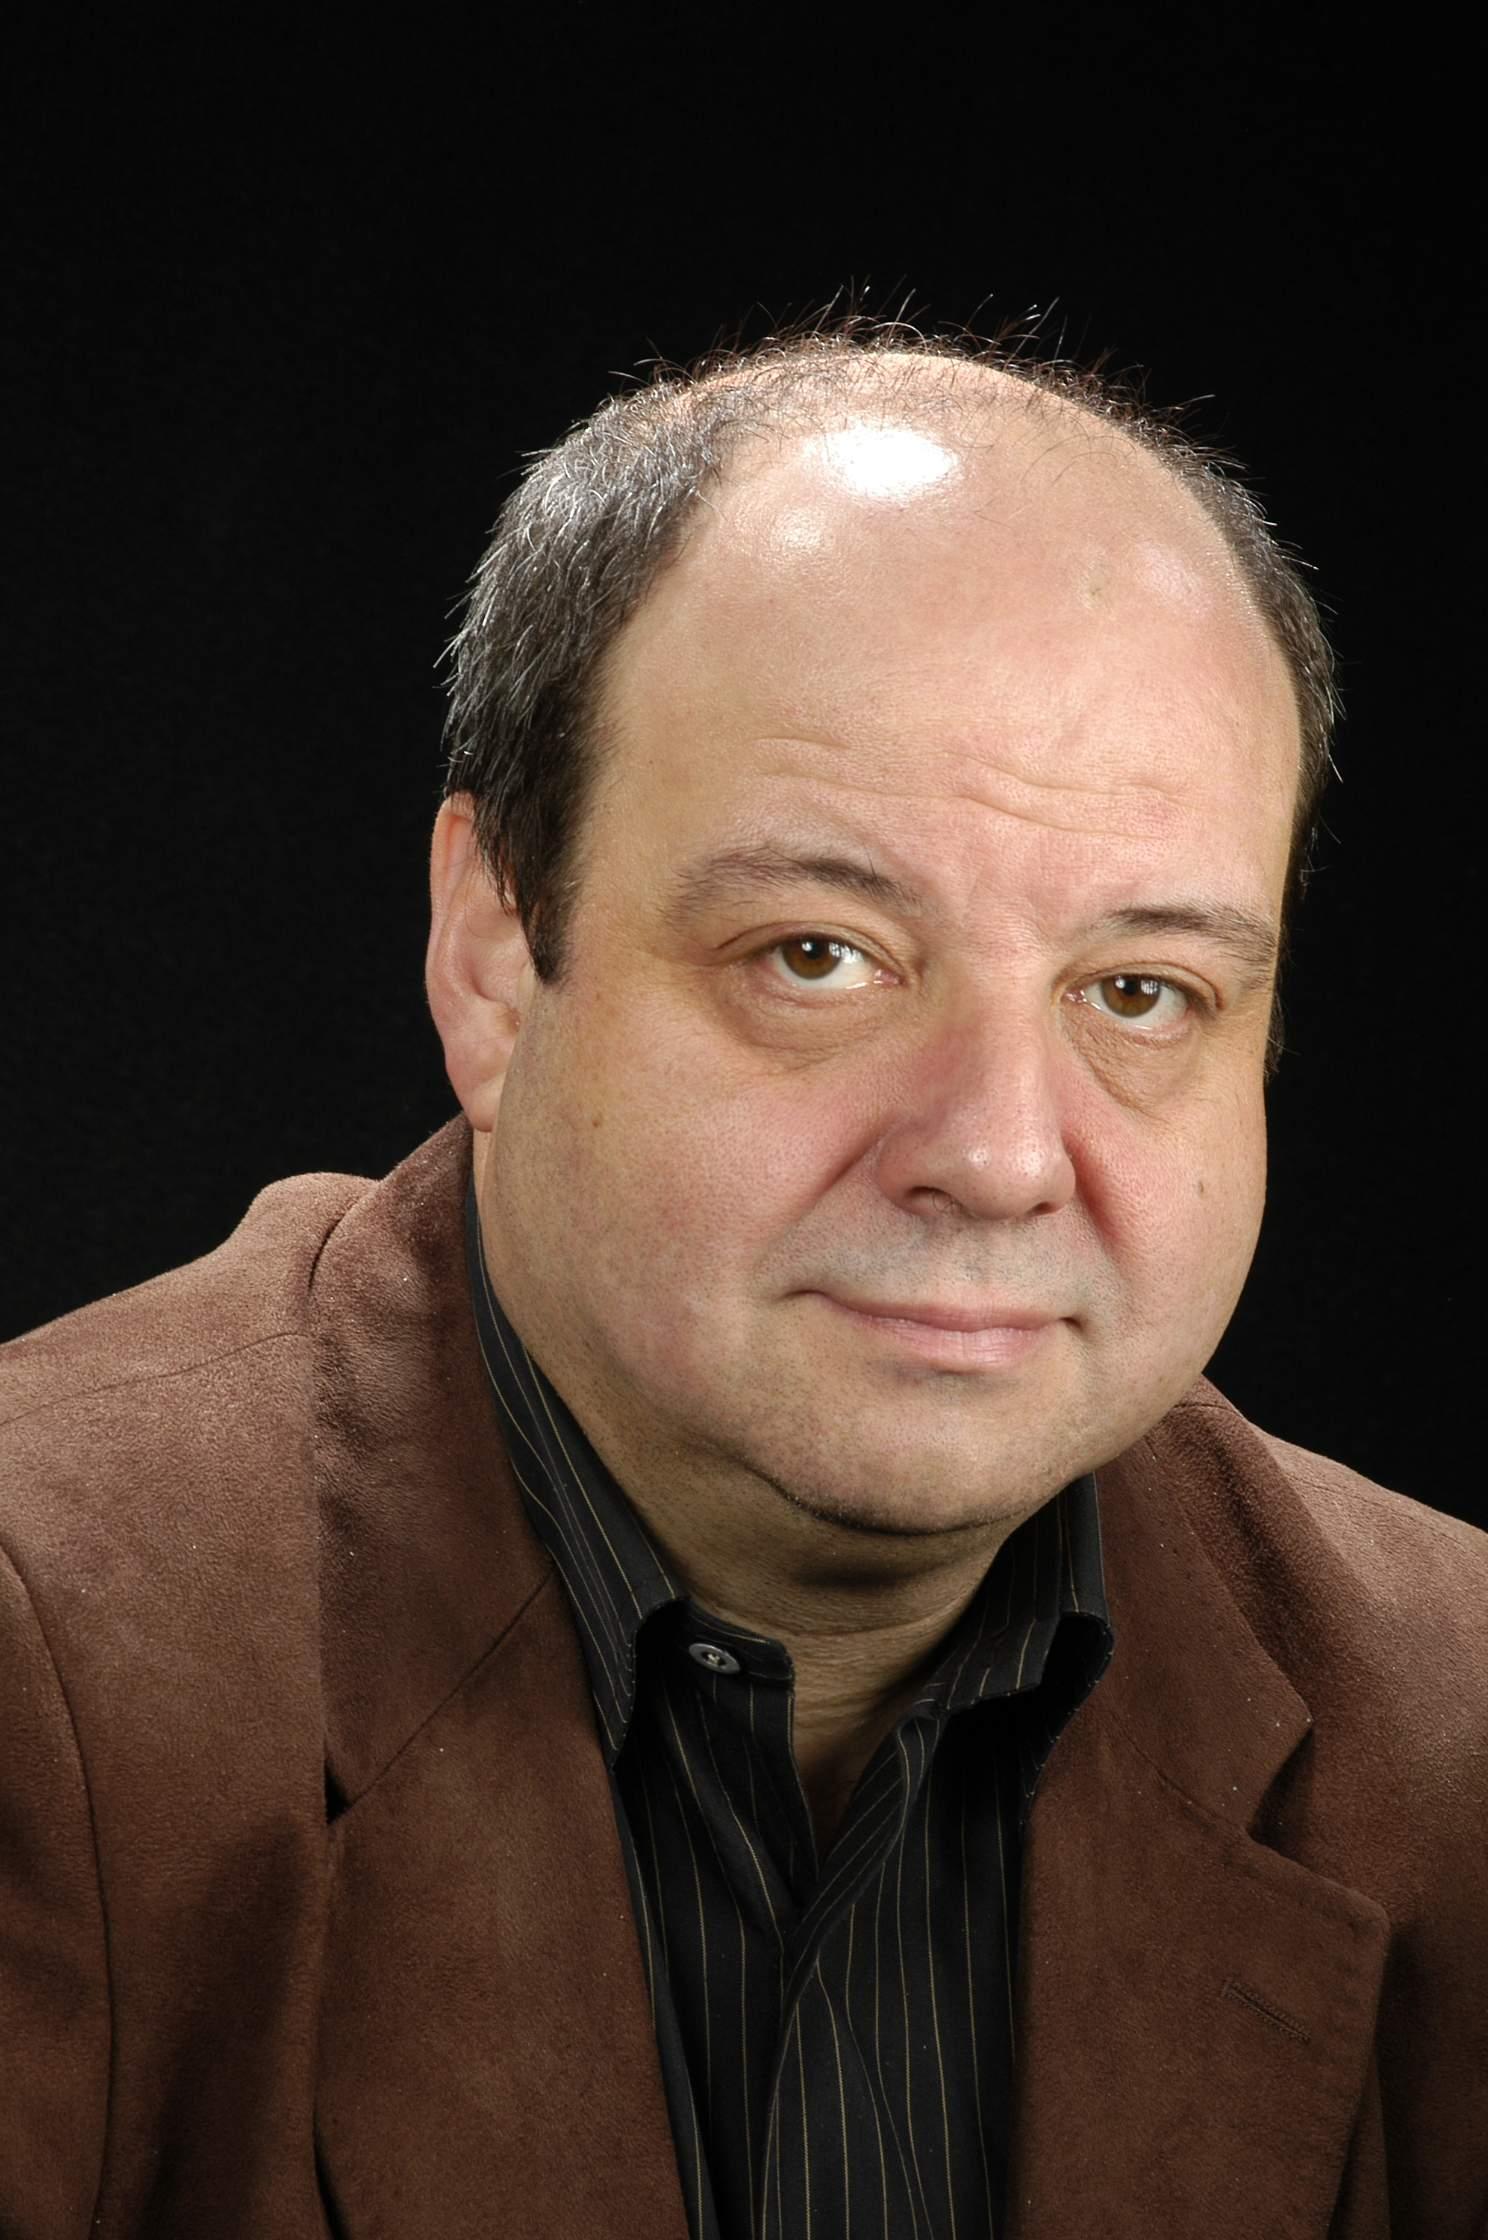 Dr. Manuel José Barbanoj Rodríguez